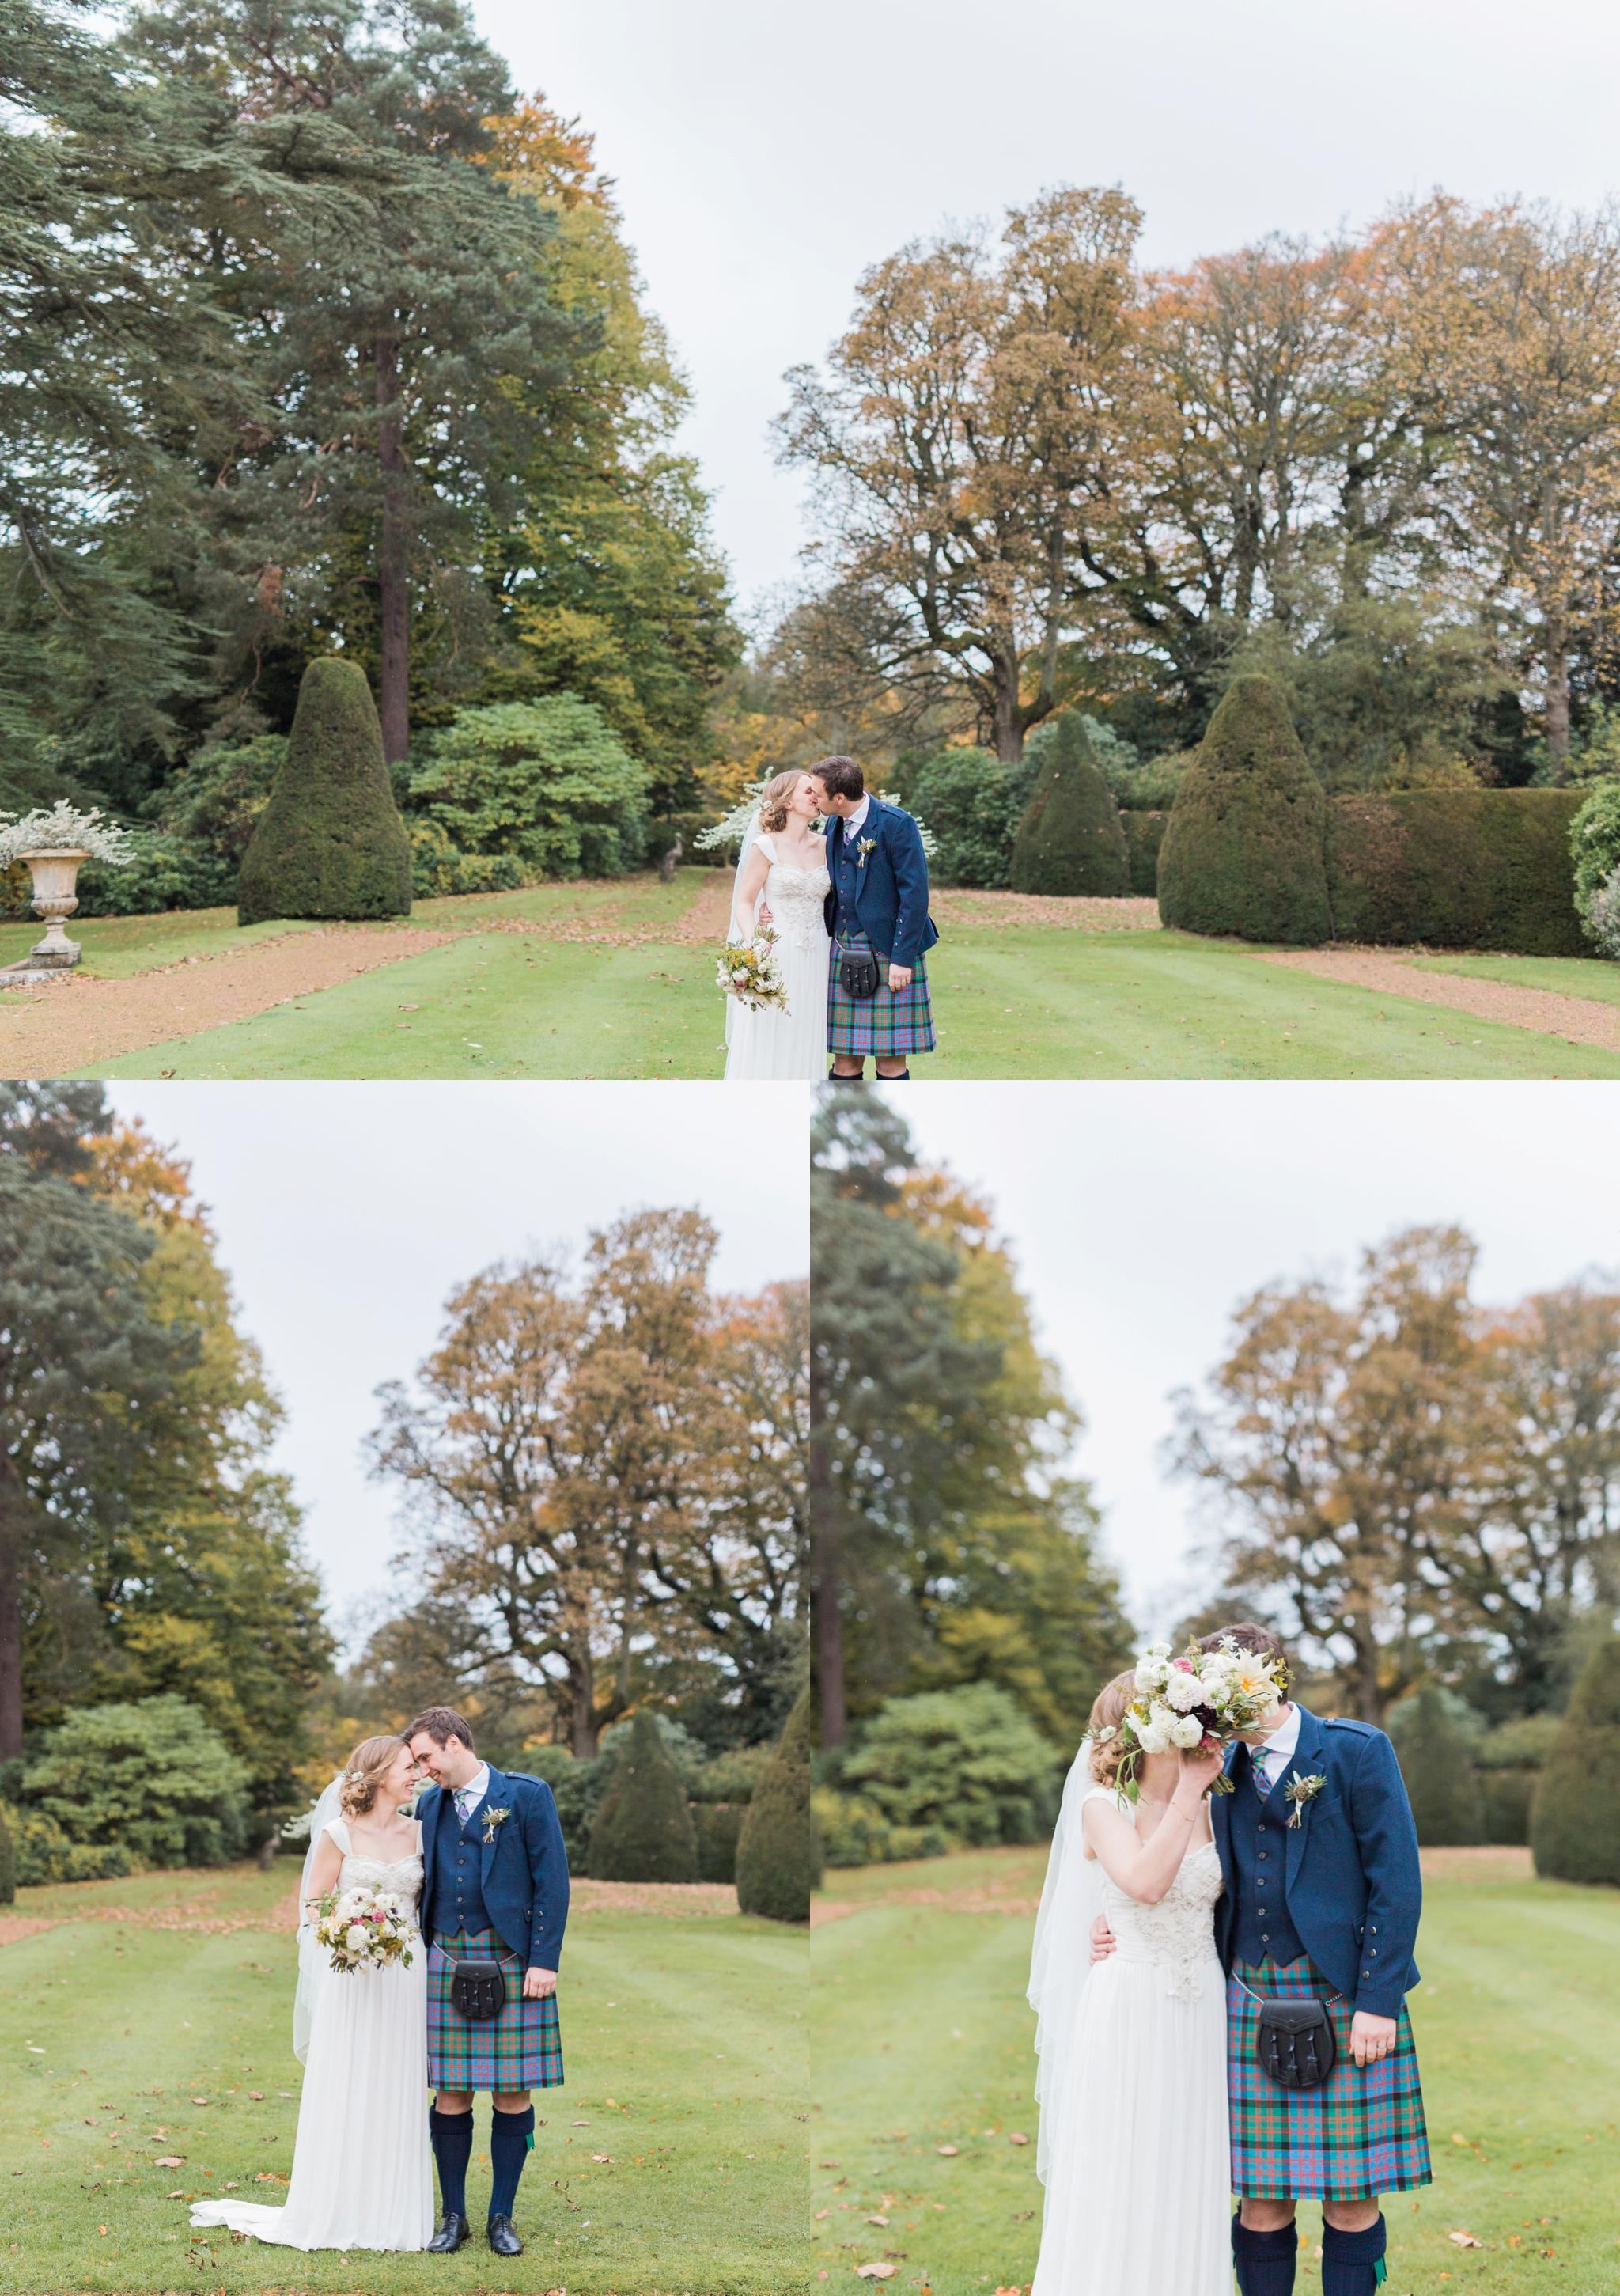 Suzanne_li_photography_kirknewton_wedding_0039.jpg